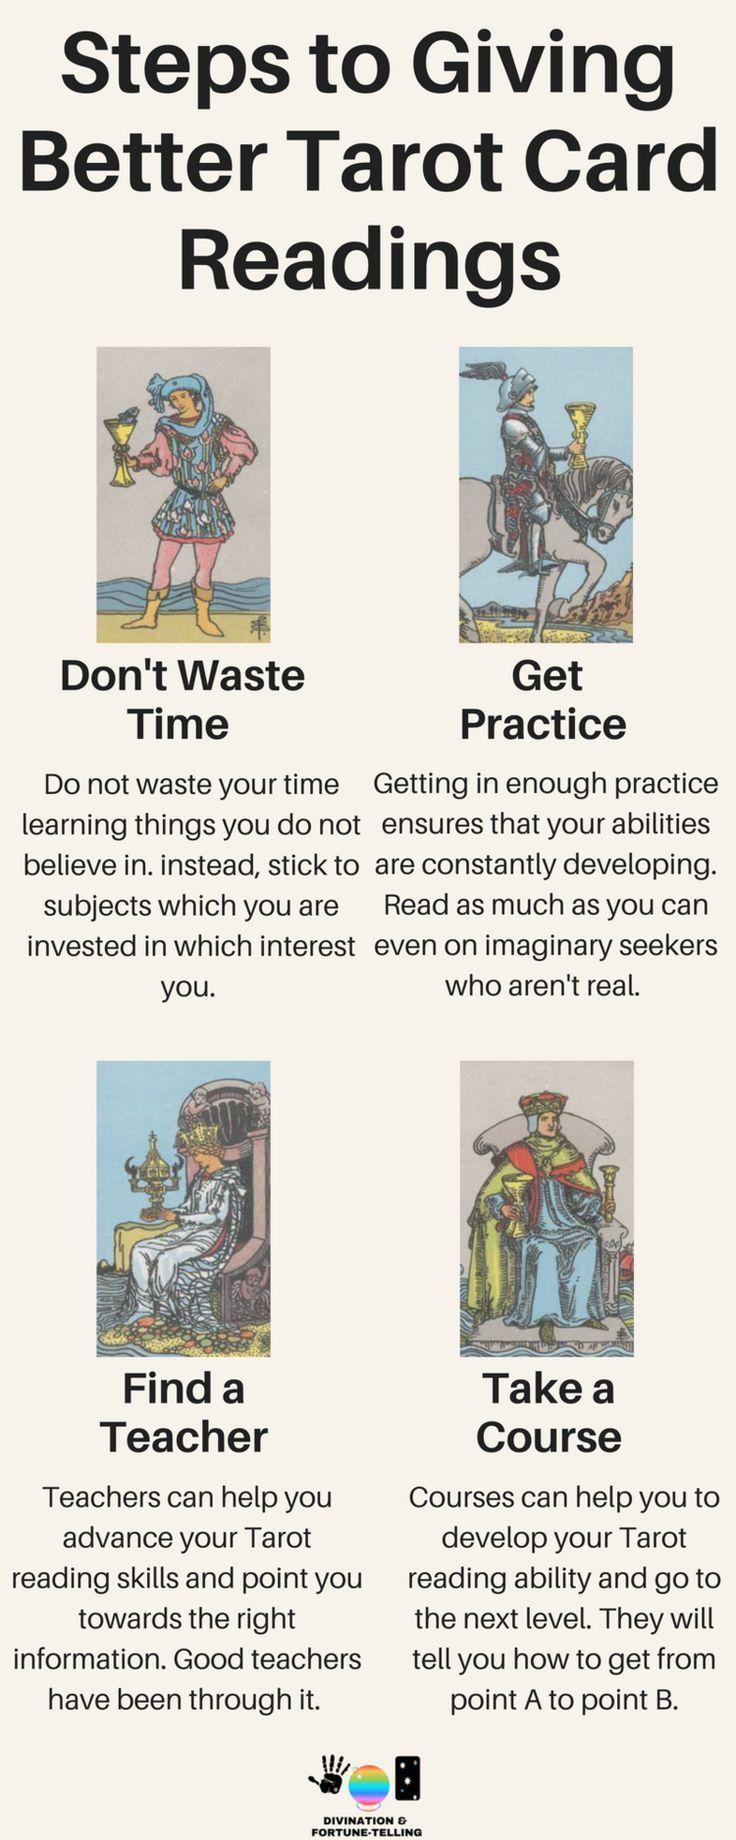 How to get better at reading tarot tarot card readers